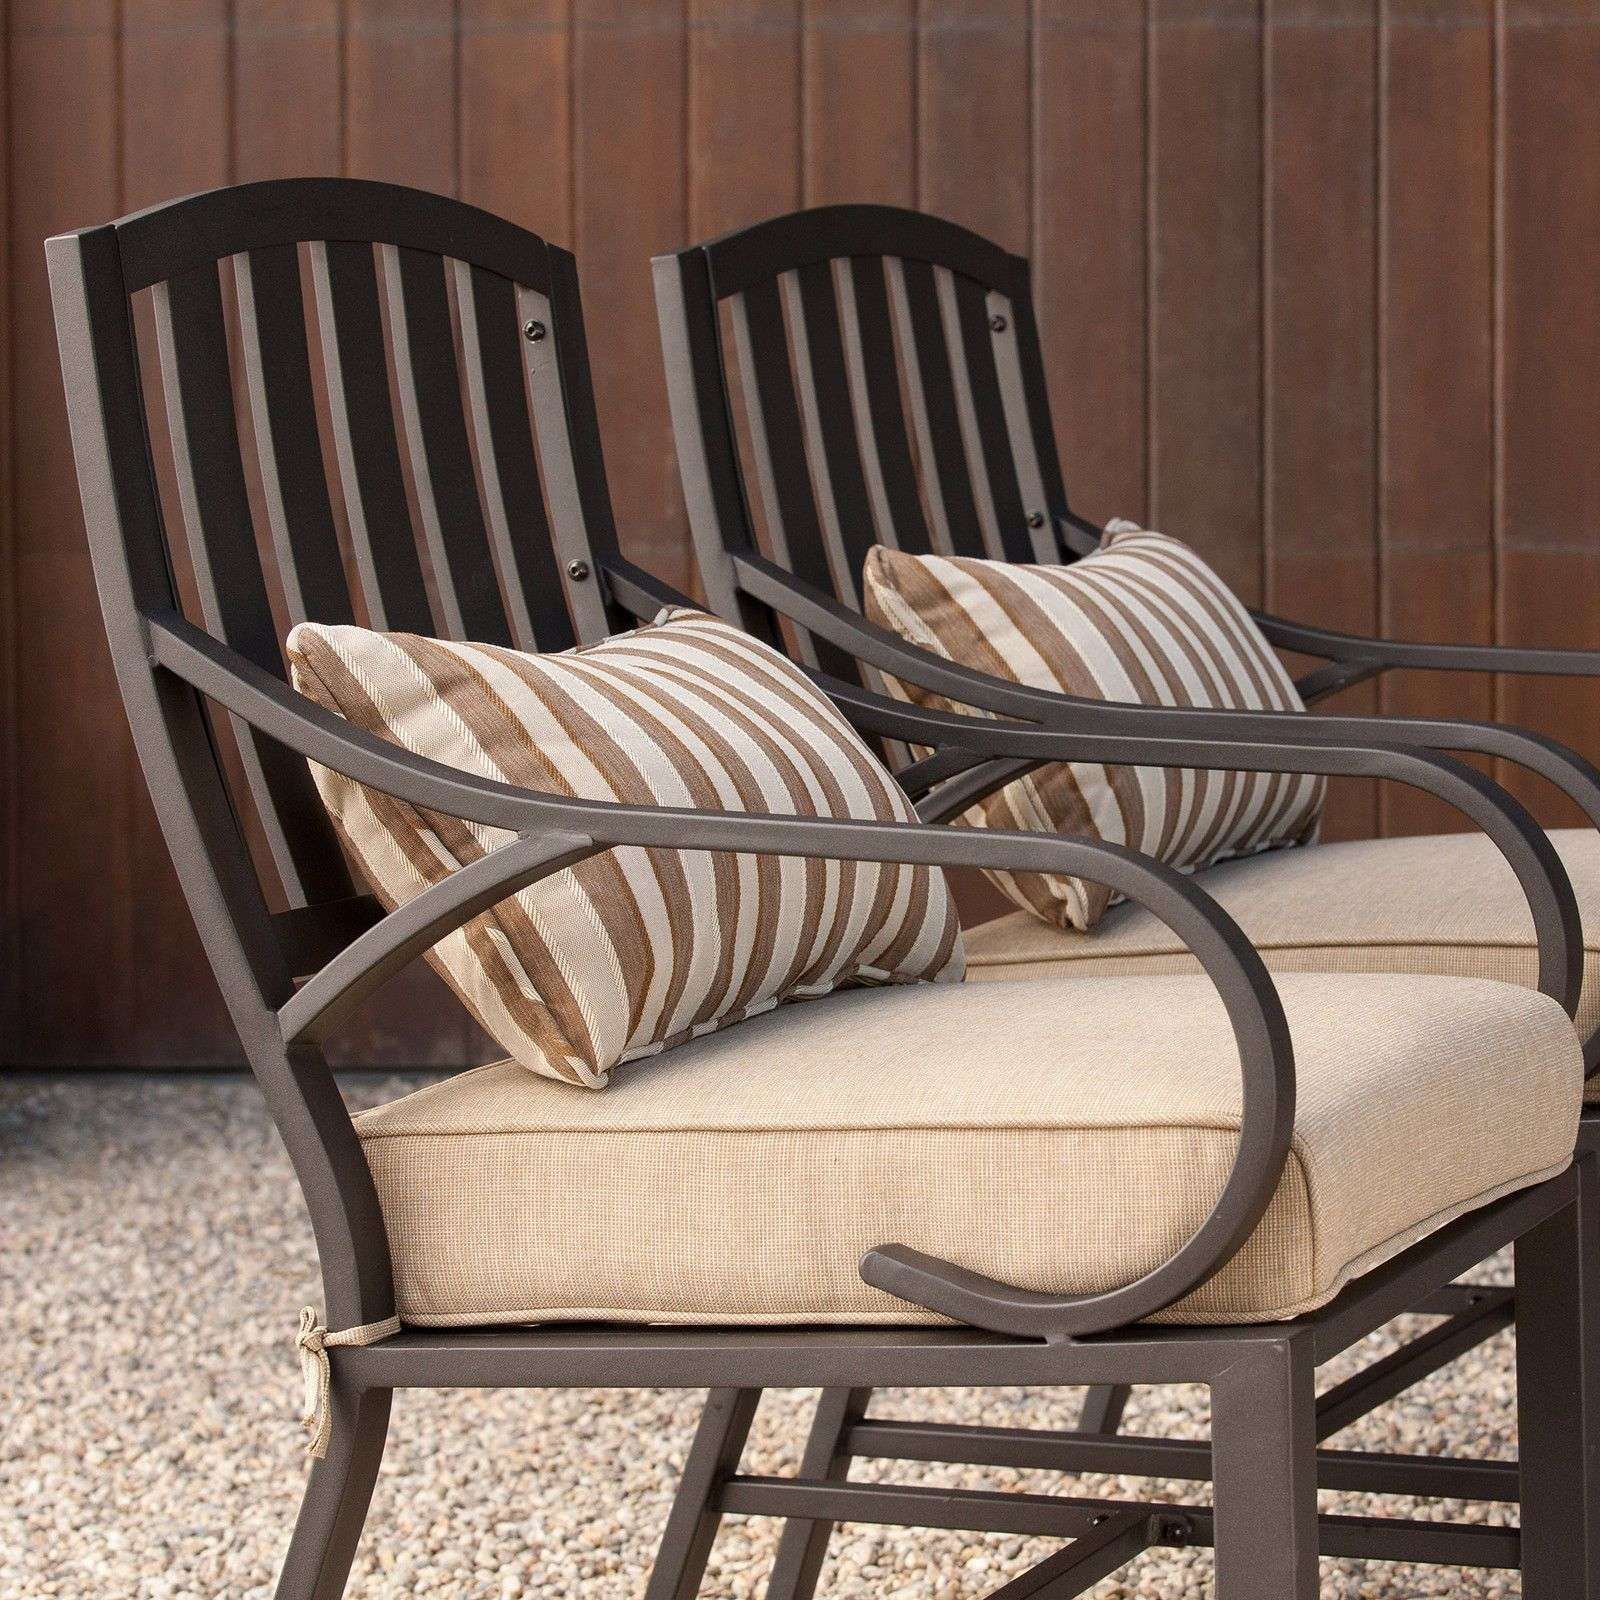 Patio Furniture Sets Clearance 7 piece Cushion Dining Aluminum